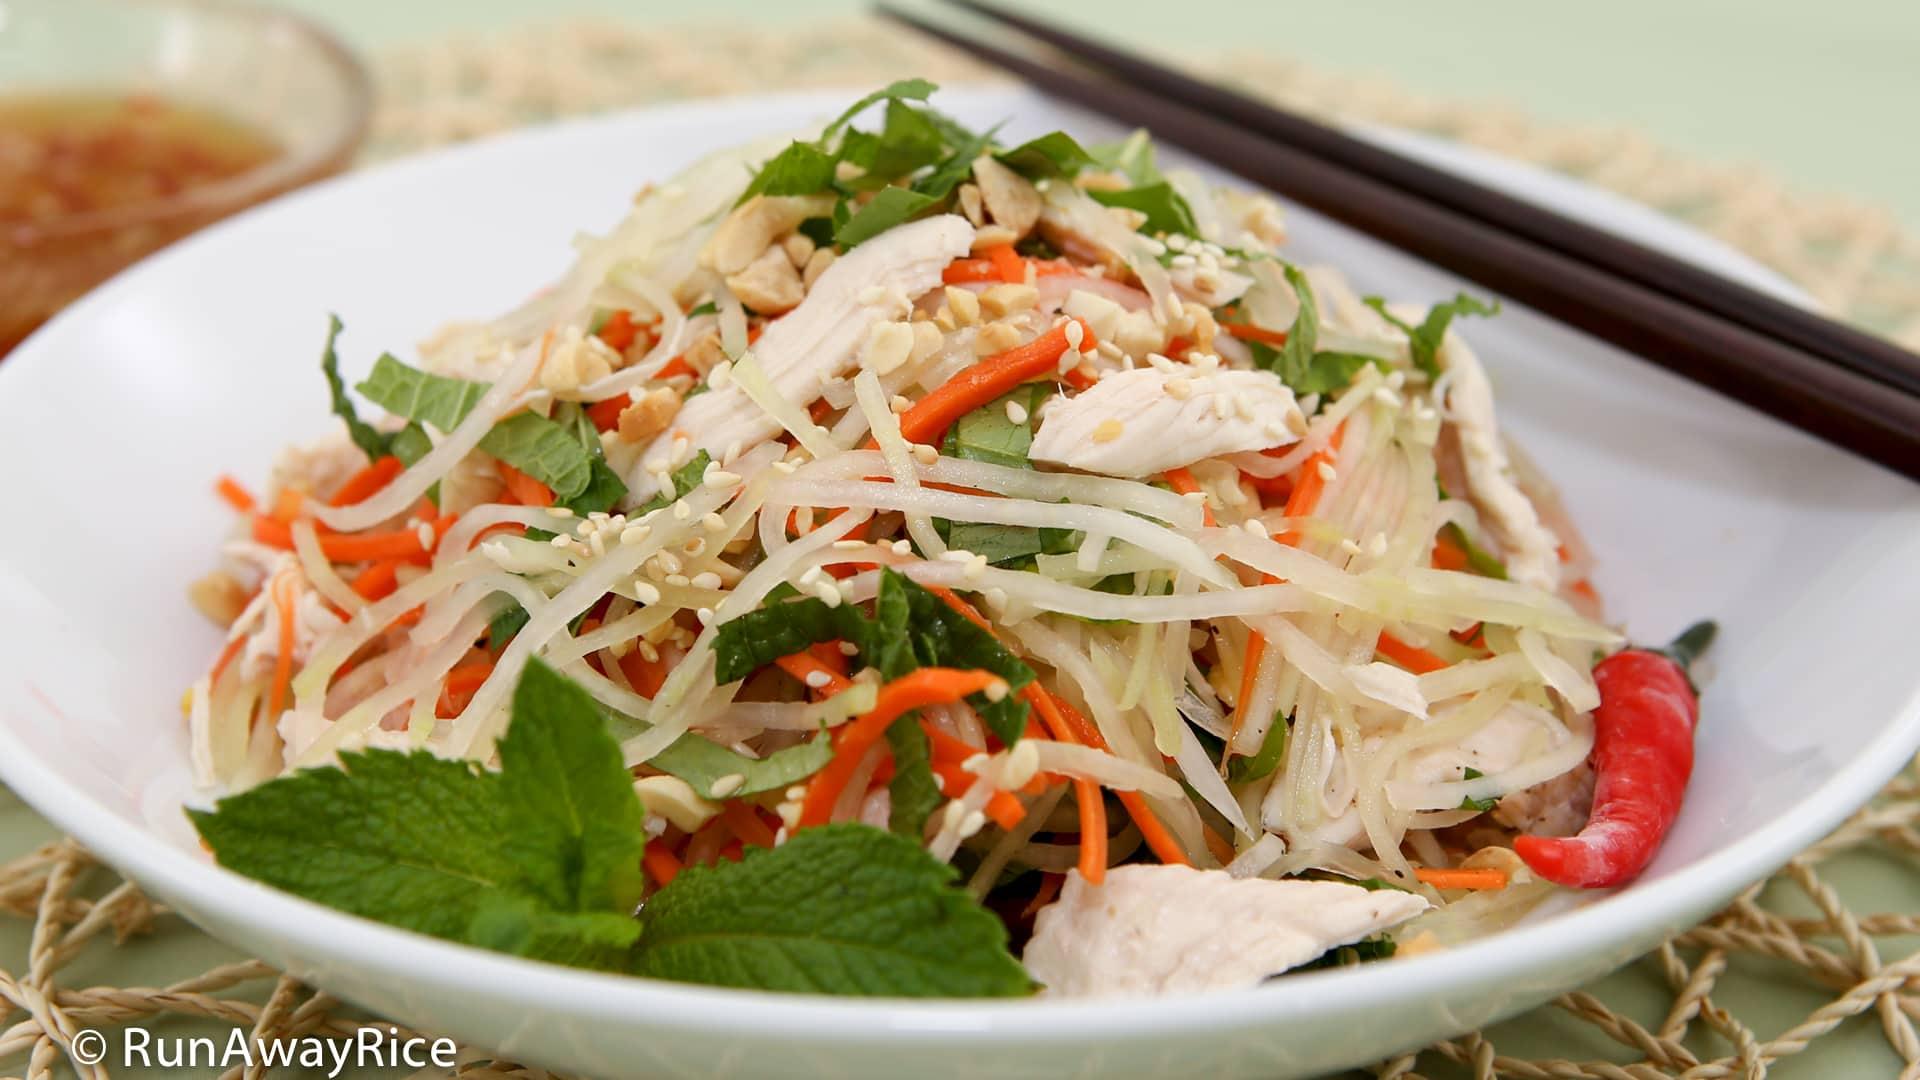 Kohlrabi Chicken Salad (Nom Su Hao Thit Ga) - refreshing and crispy salad with a flavorful dressing | recipe from runawayrice.com